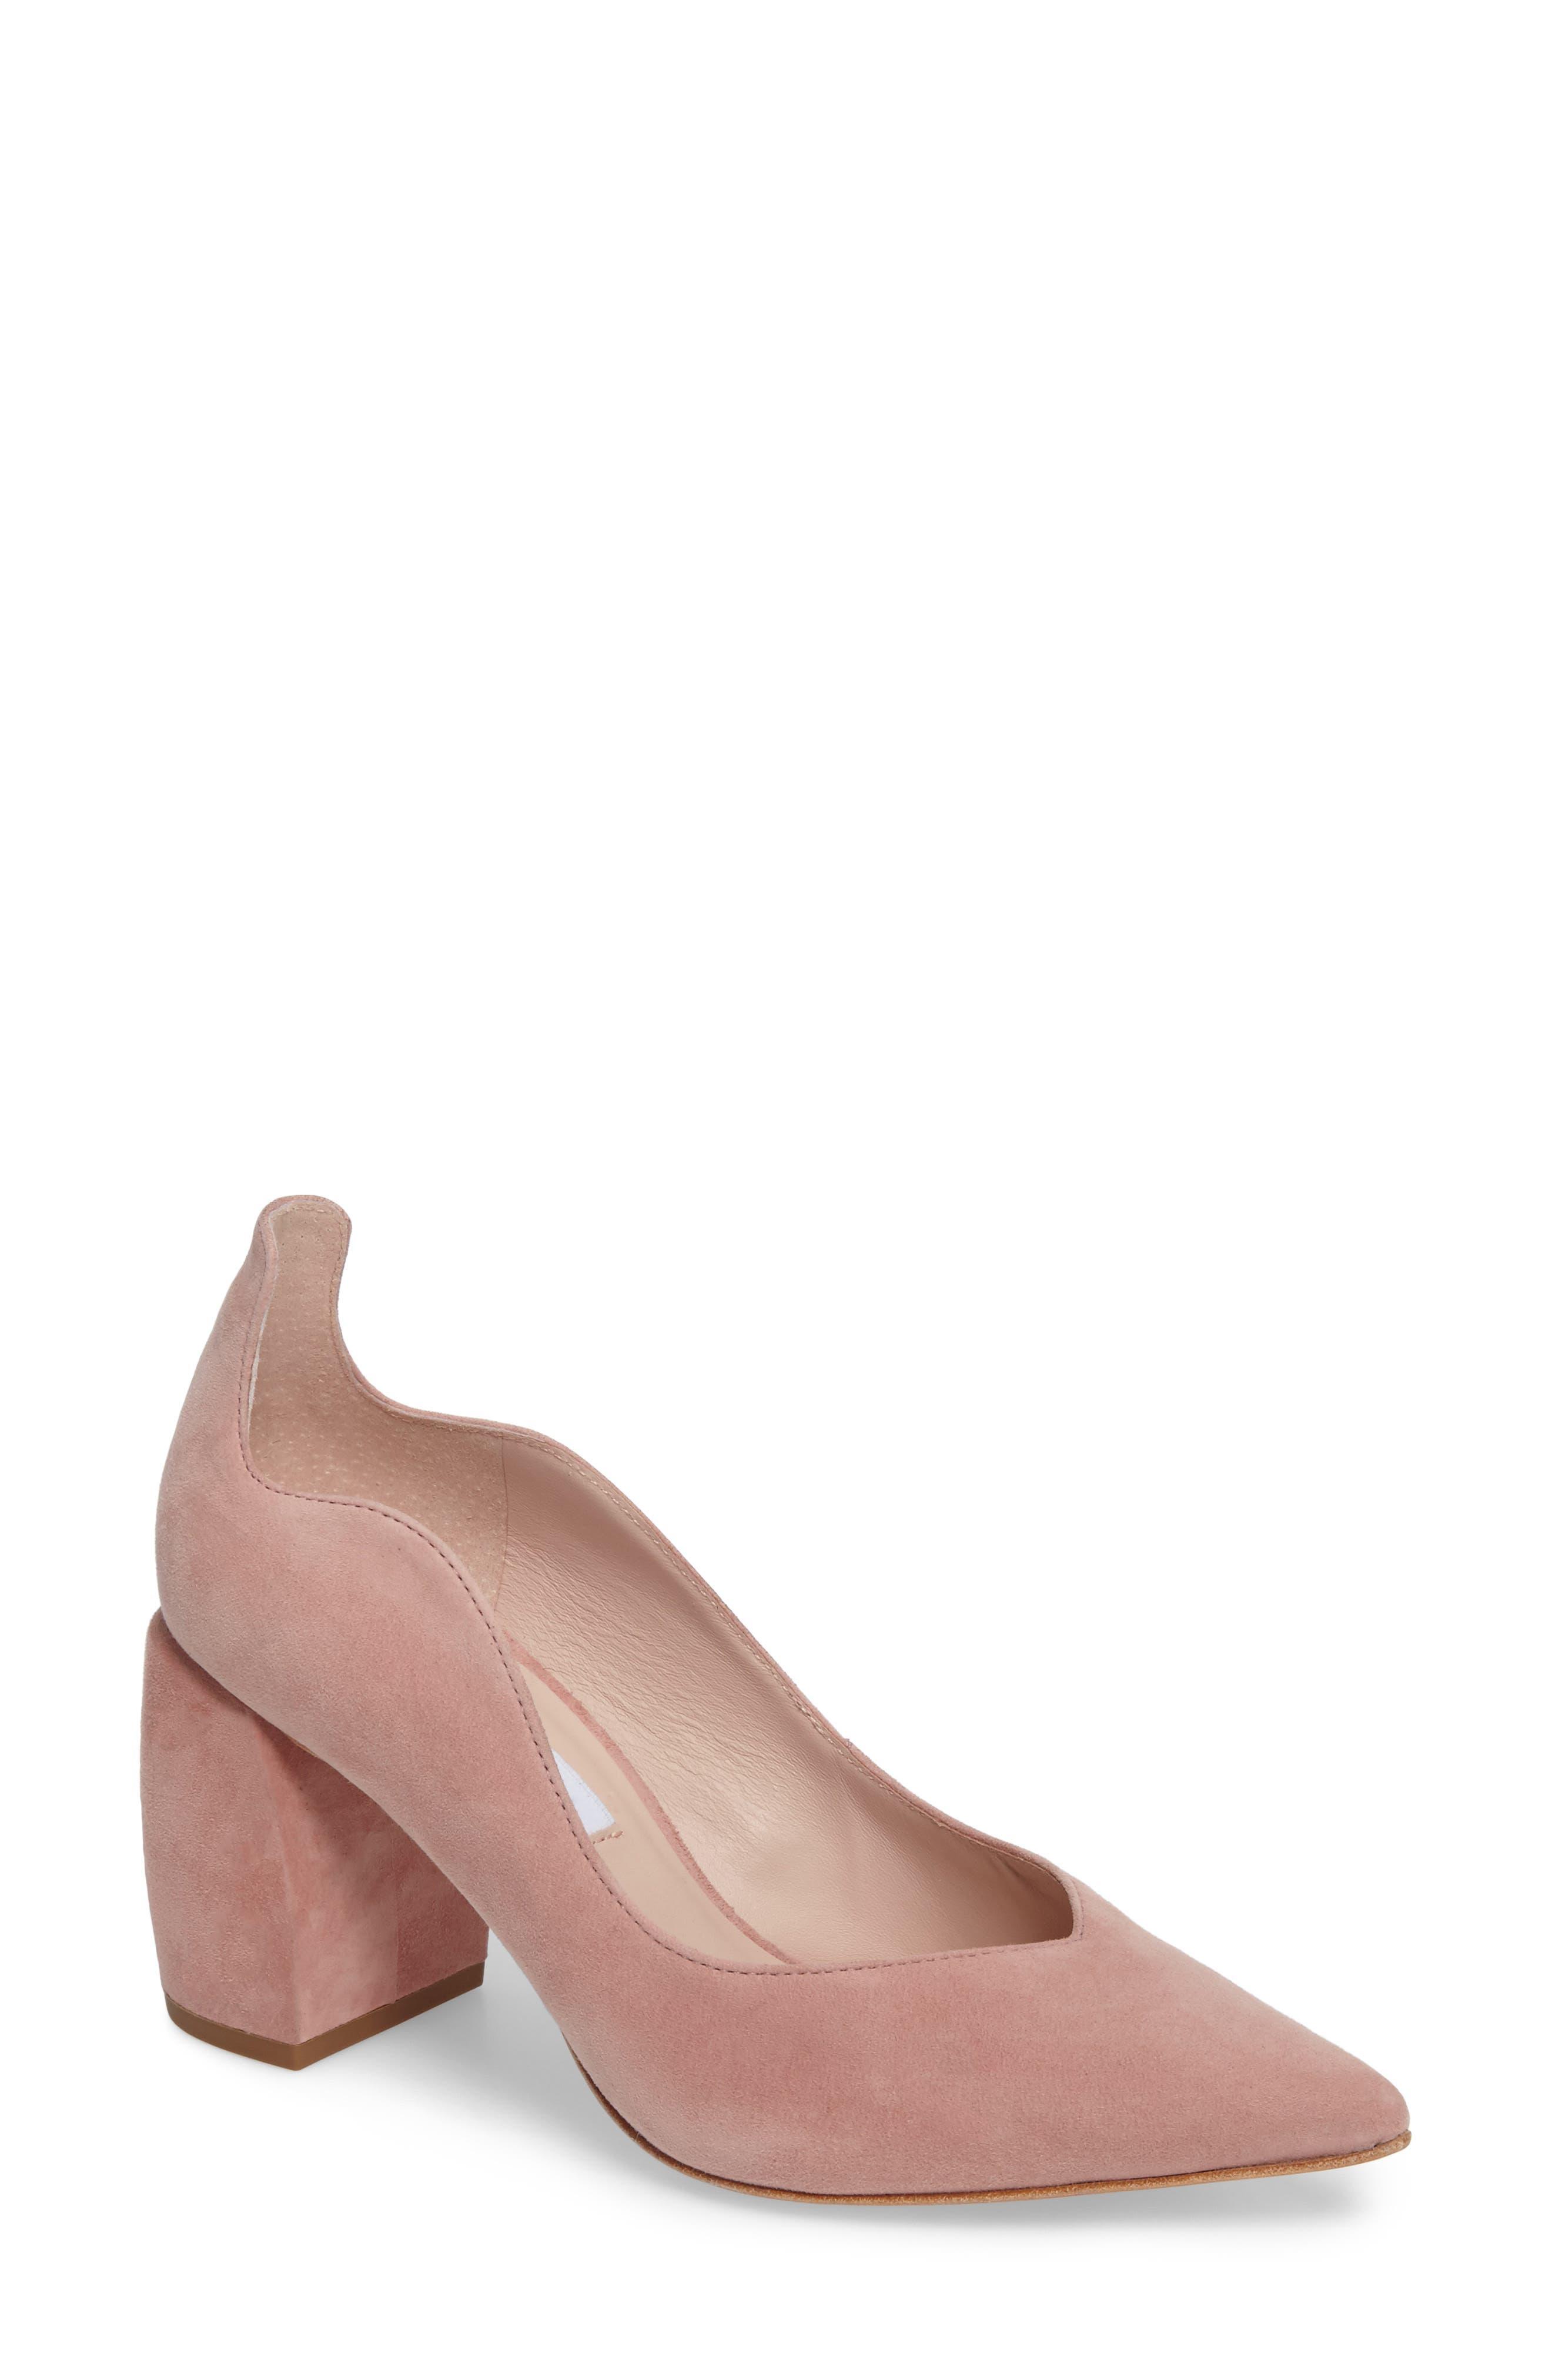 Erin Chunky Heel Pump,                         Main,                         color, Blush Suede